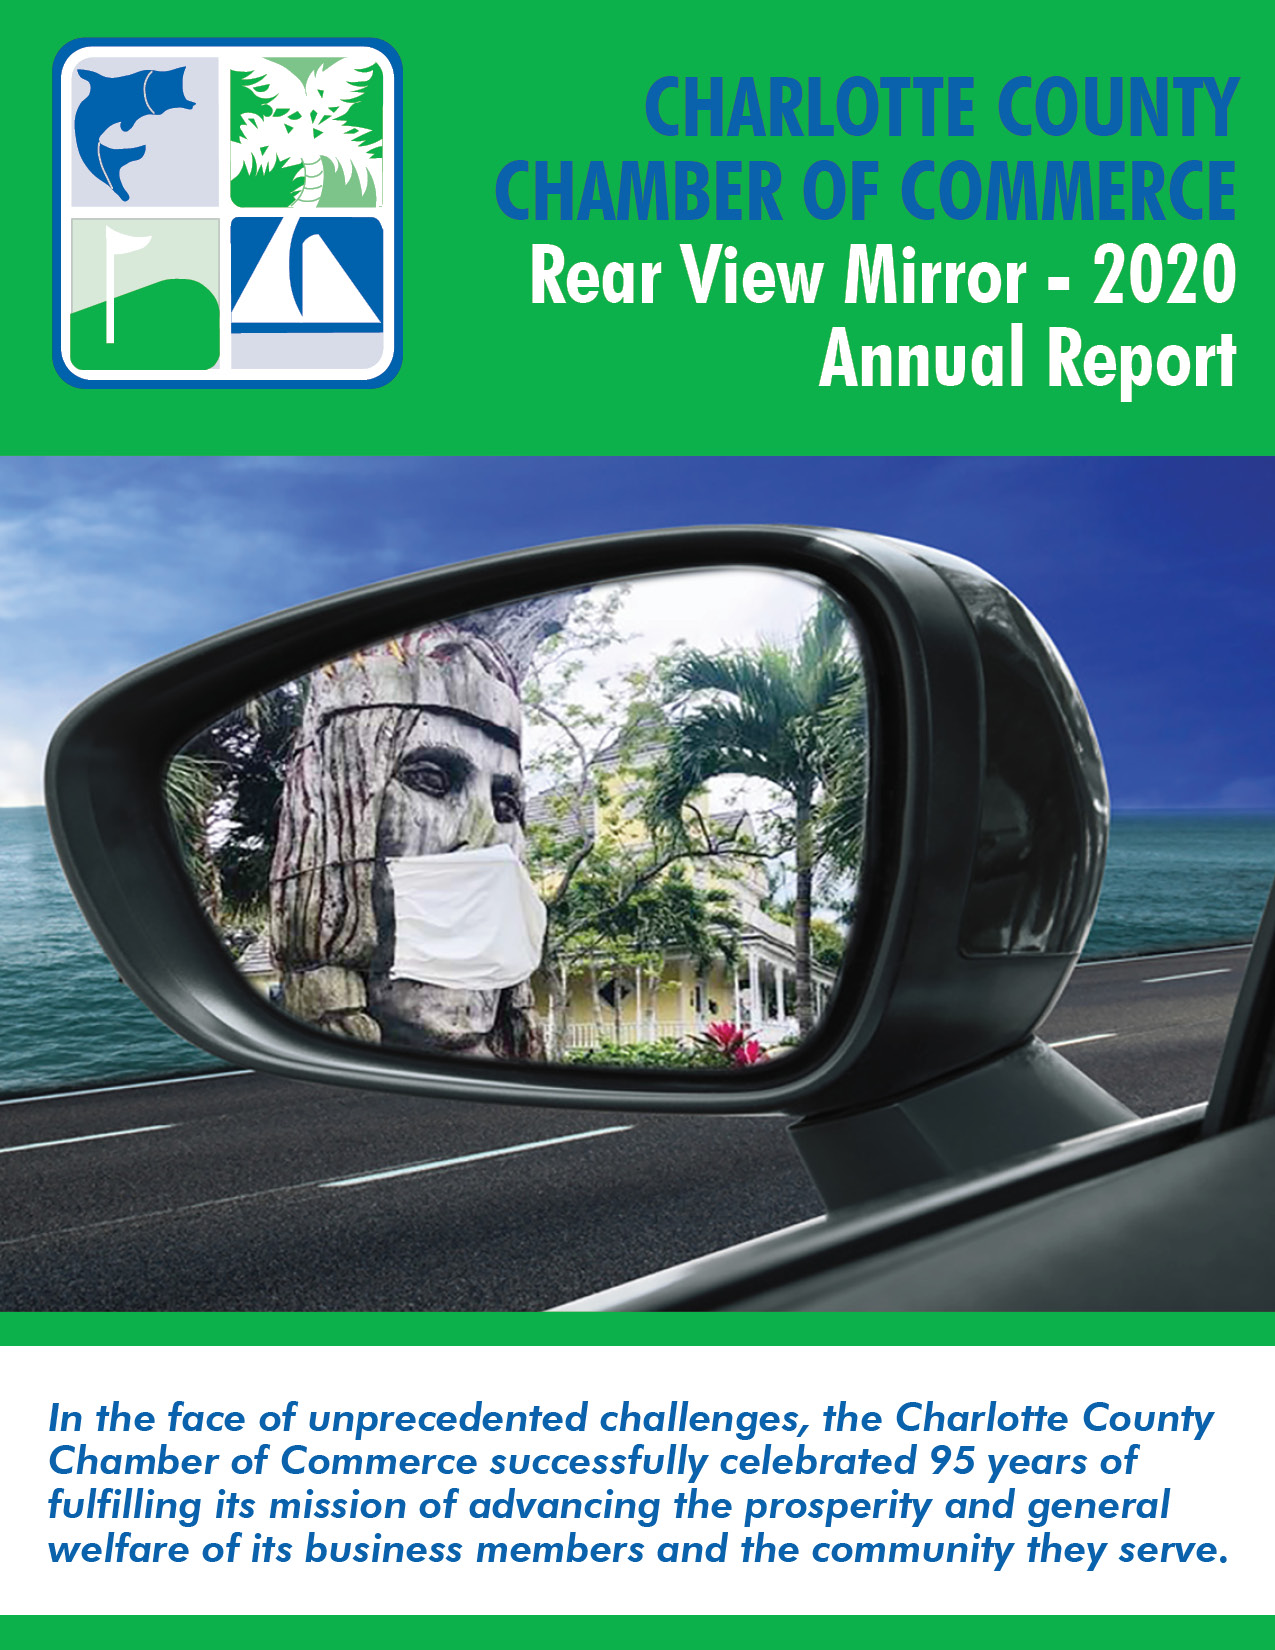 CC ANNUAL REPORT 2020_PG1